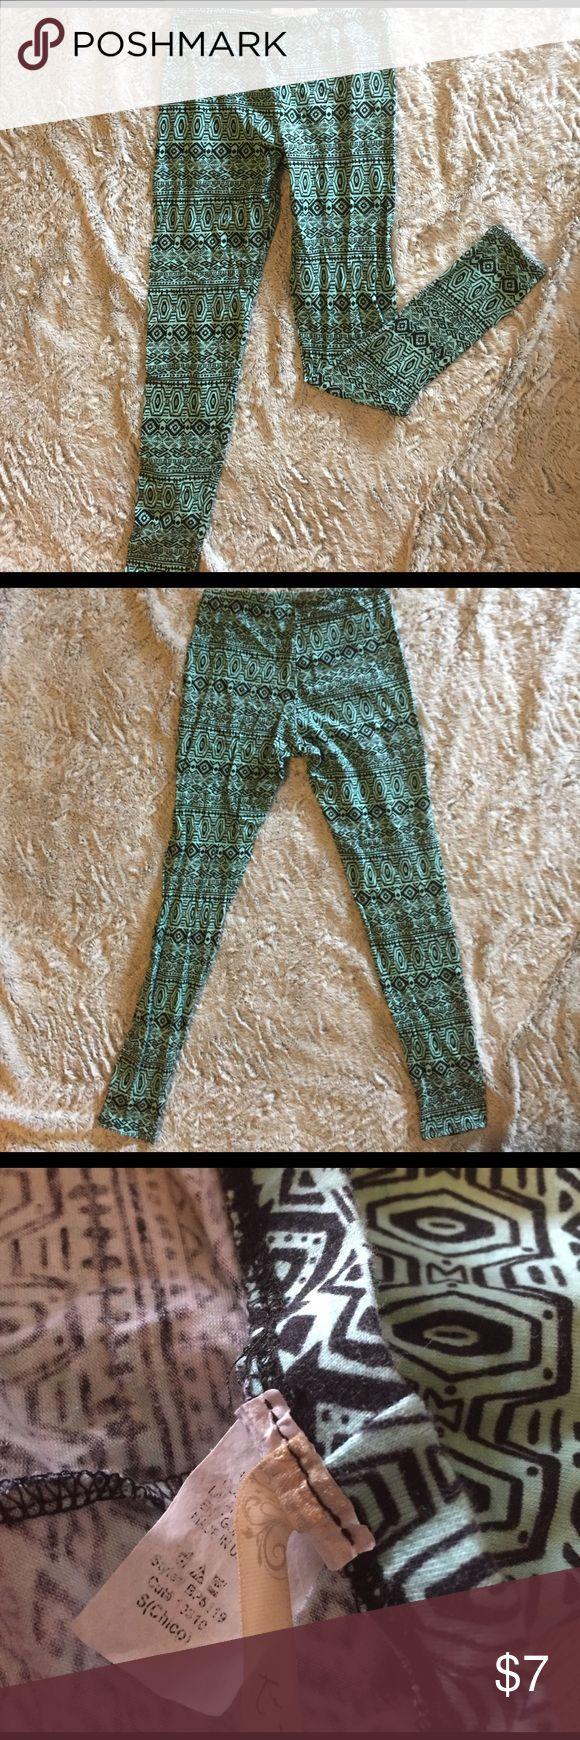 TRIBAL PRINT LEGGINGS Tribal print // excellent condition // comfortable // hardly worn Pants Leggings